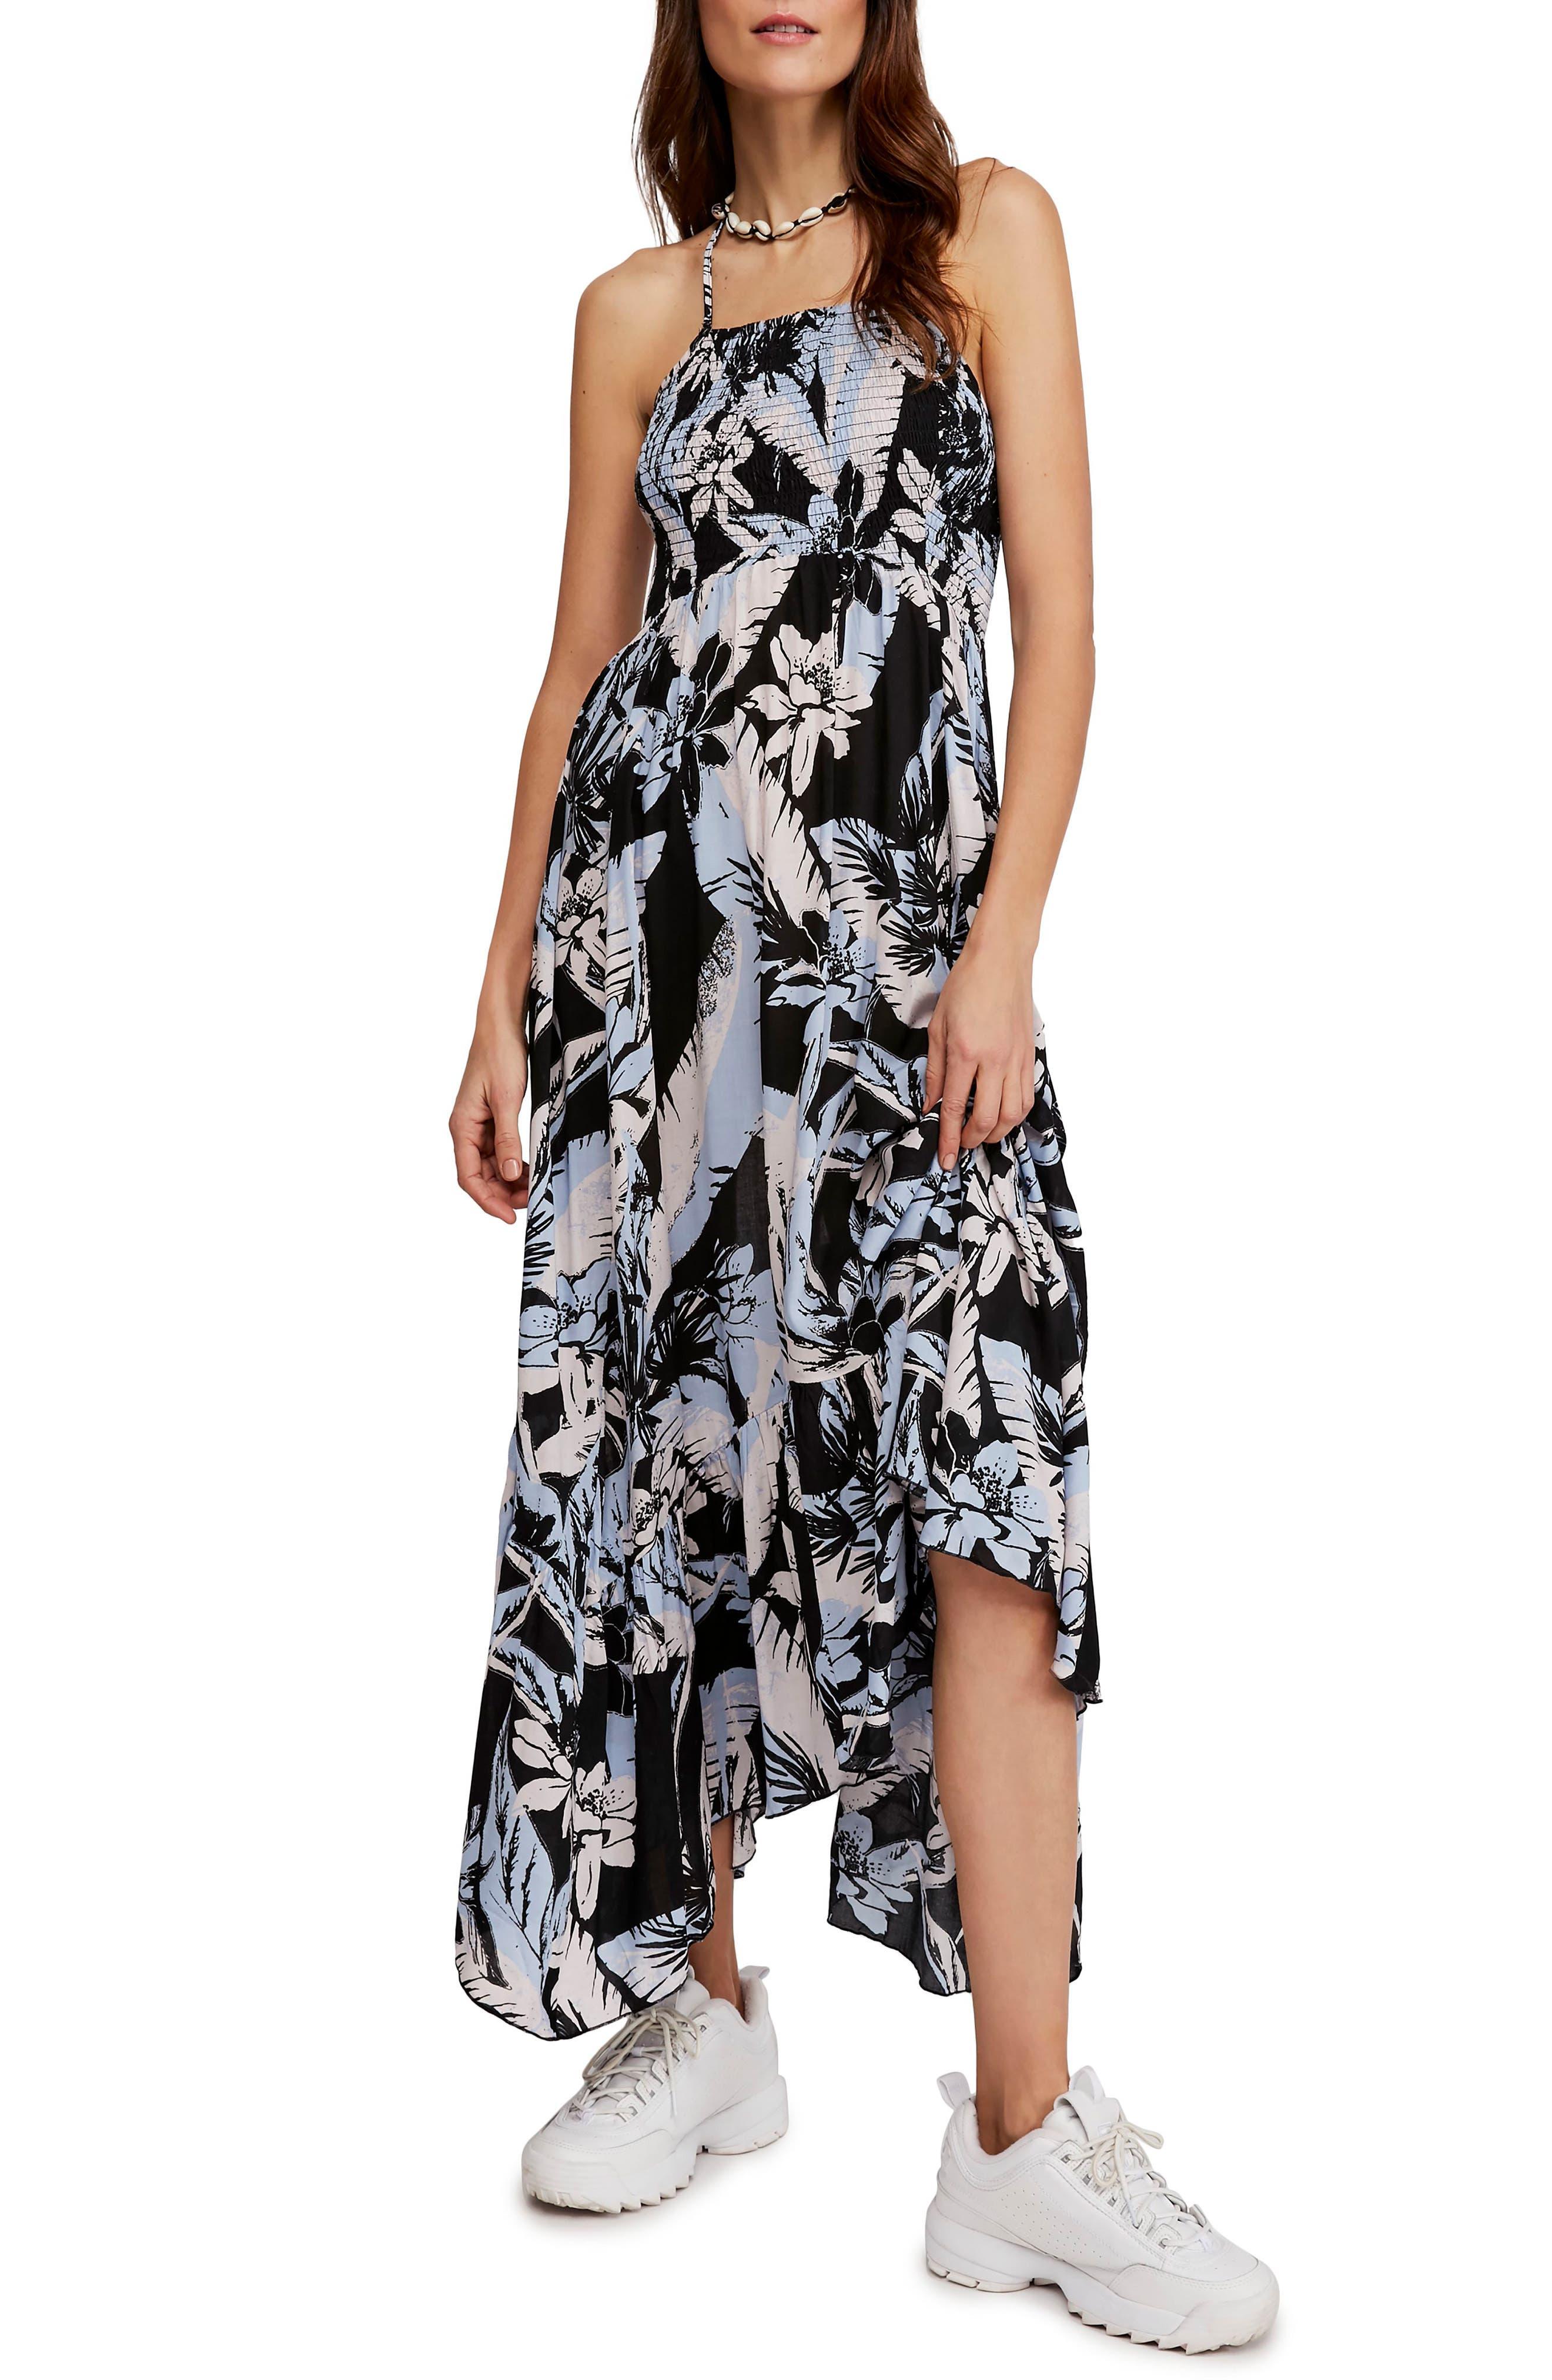 Free People Heat Wave Floral Print High/low Dress, Black